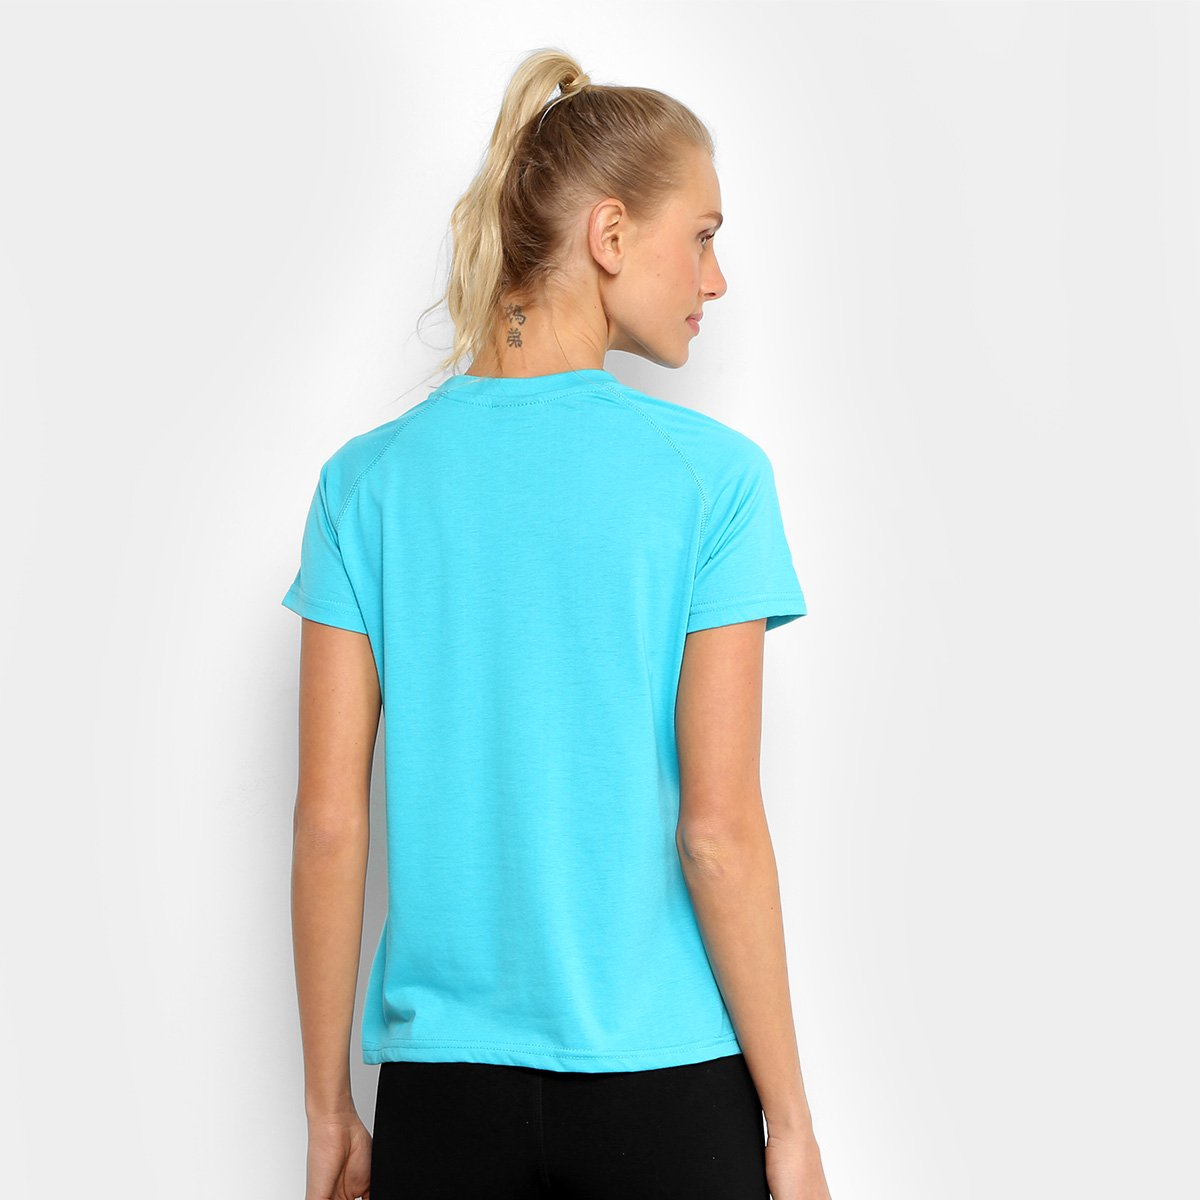 Turquesa Feminina Camiseta Azul Kappa Verona Kappa Camiseta wzqP60H